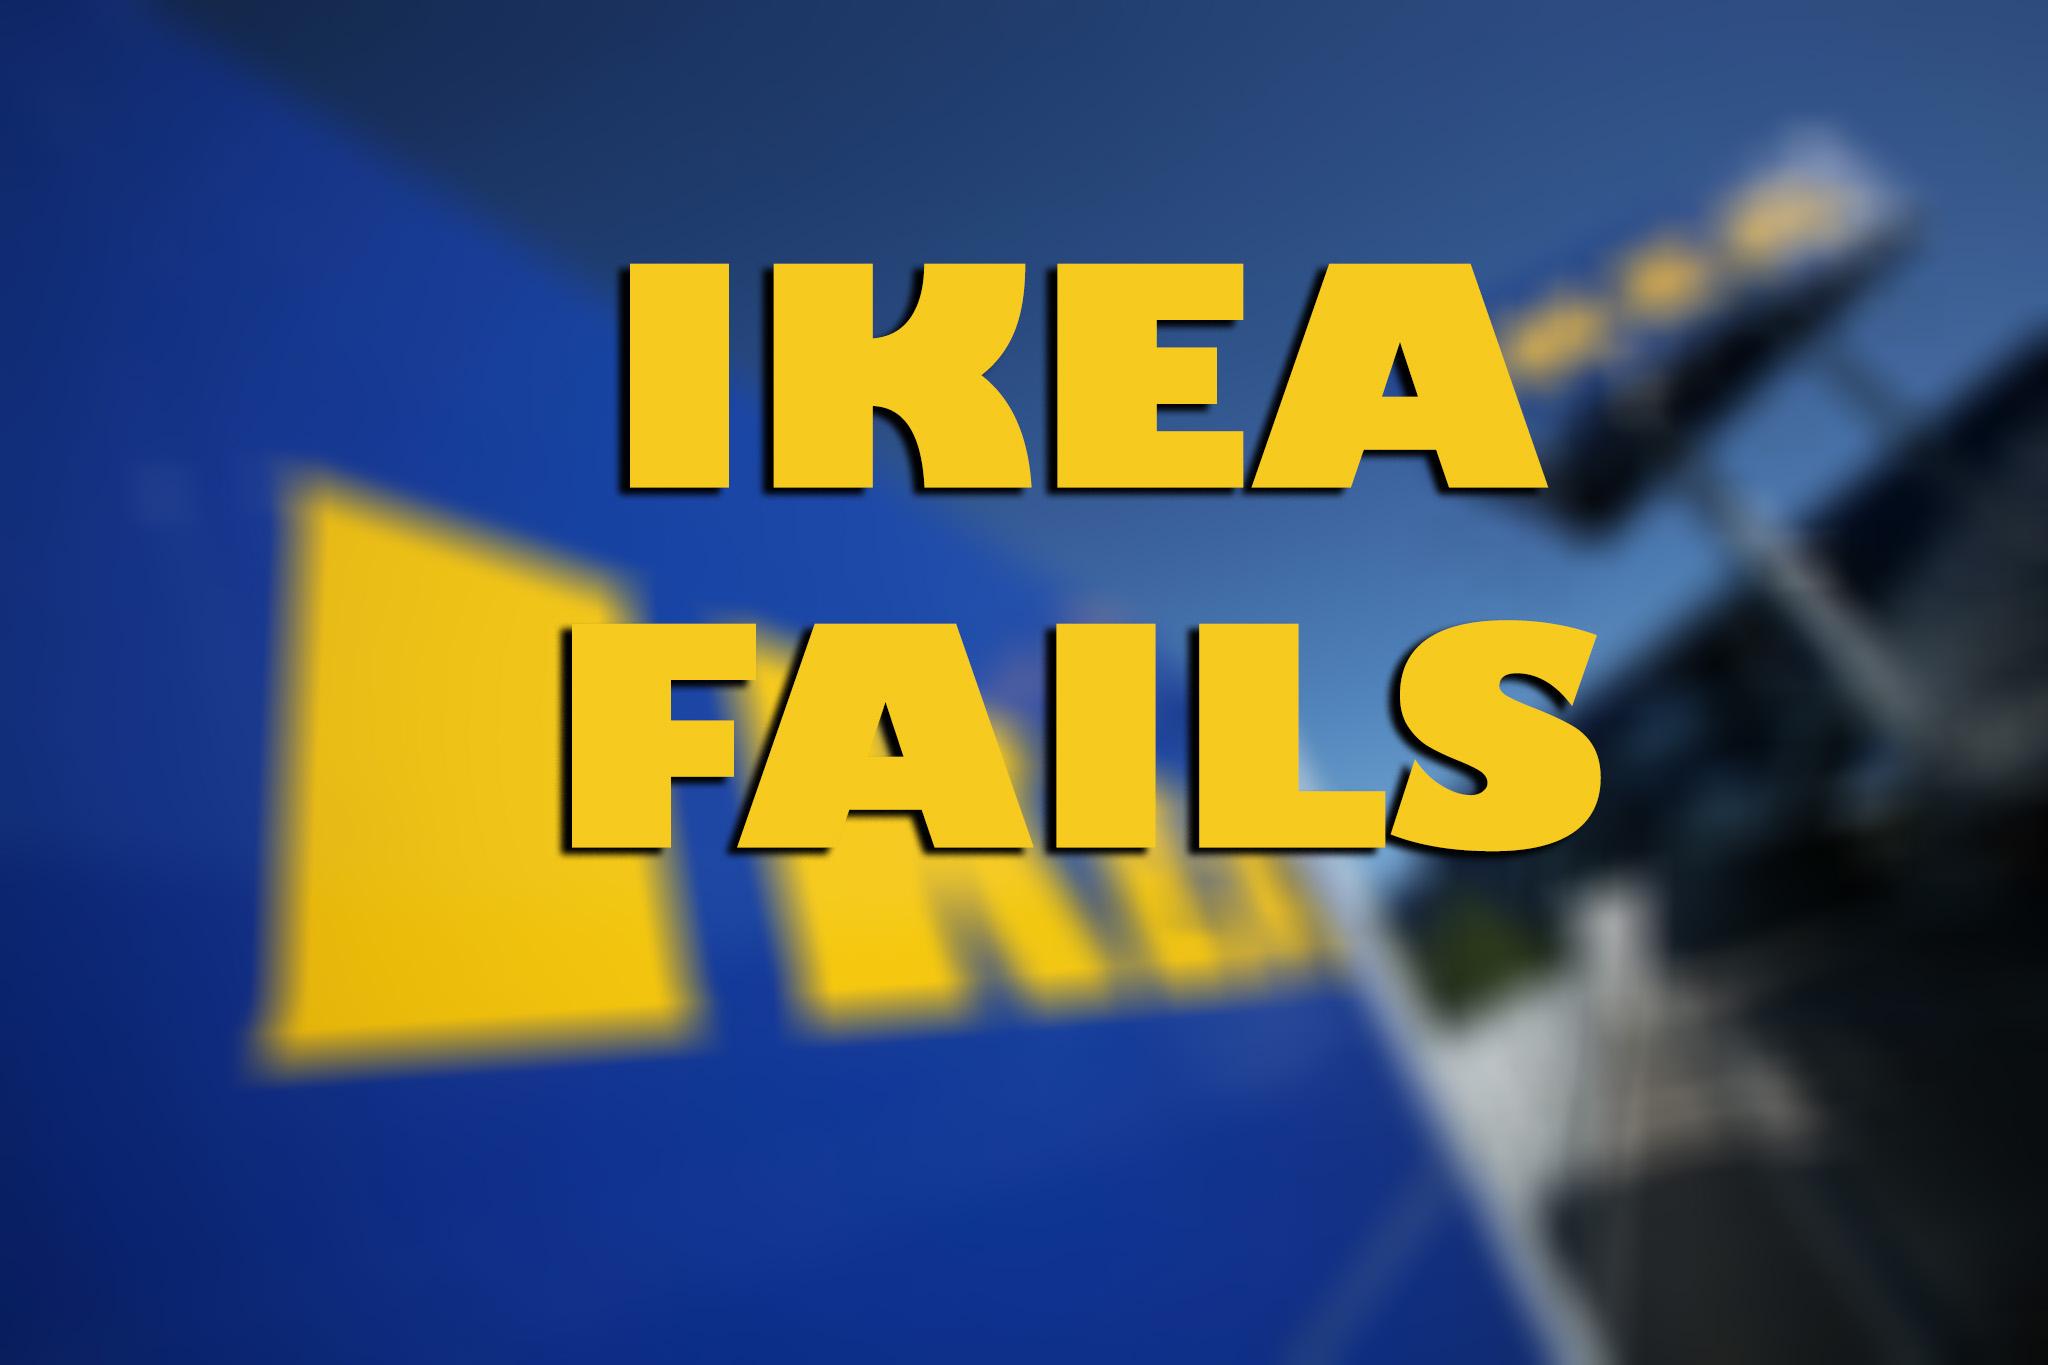 2f34842f1 Ikea wants Swedish women to pee on this new ad - SFGate